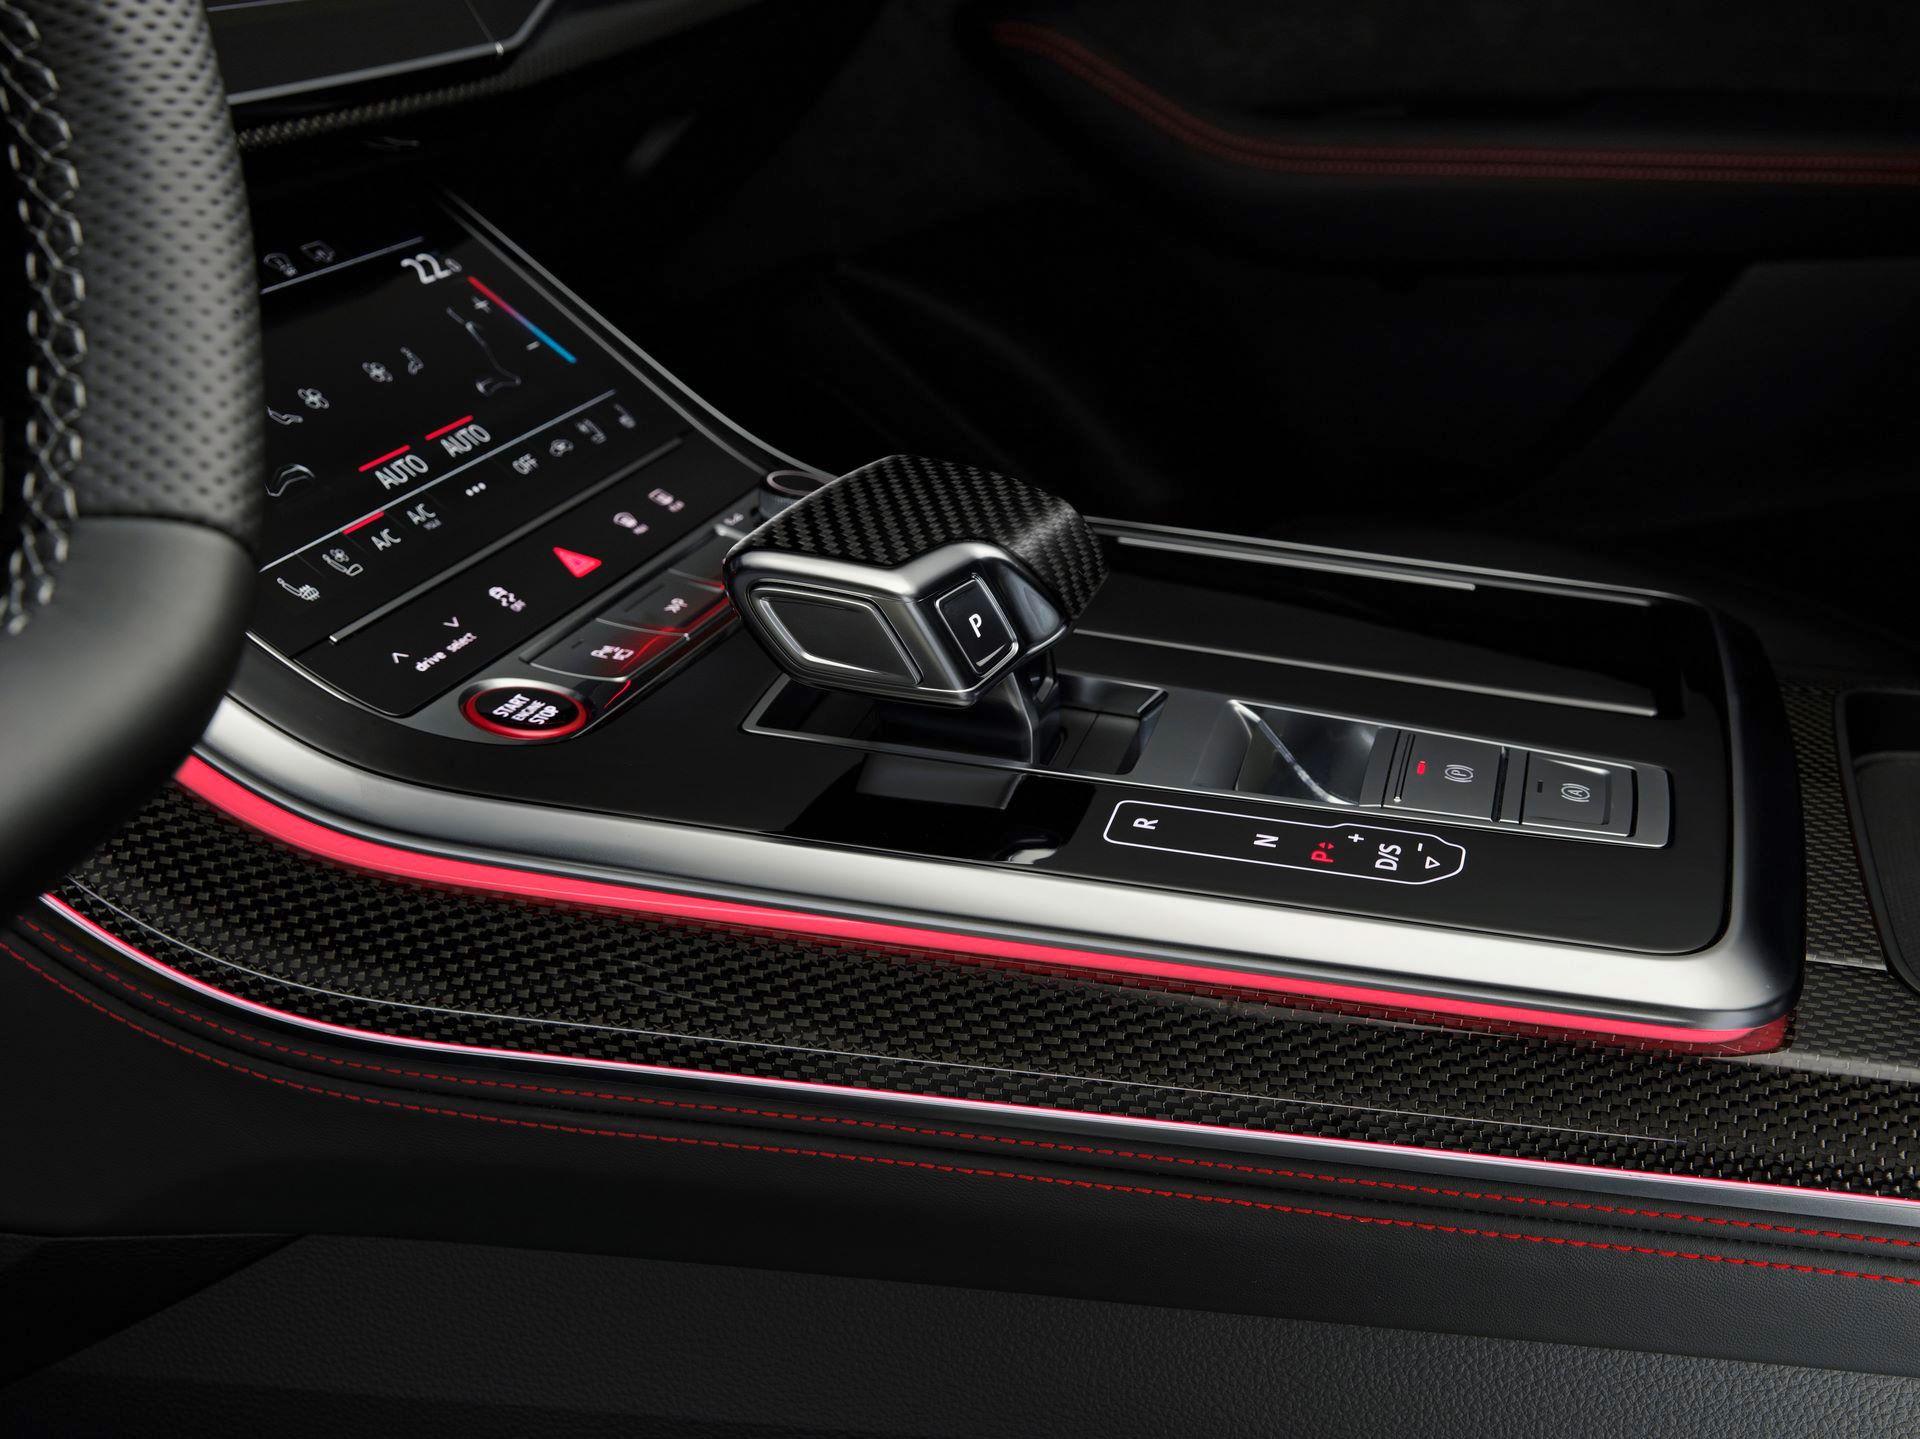 Audi-A4-A5-Q7-Q8-Competition-And-Competition-Plus-Trims-33